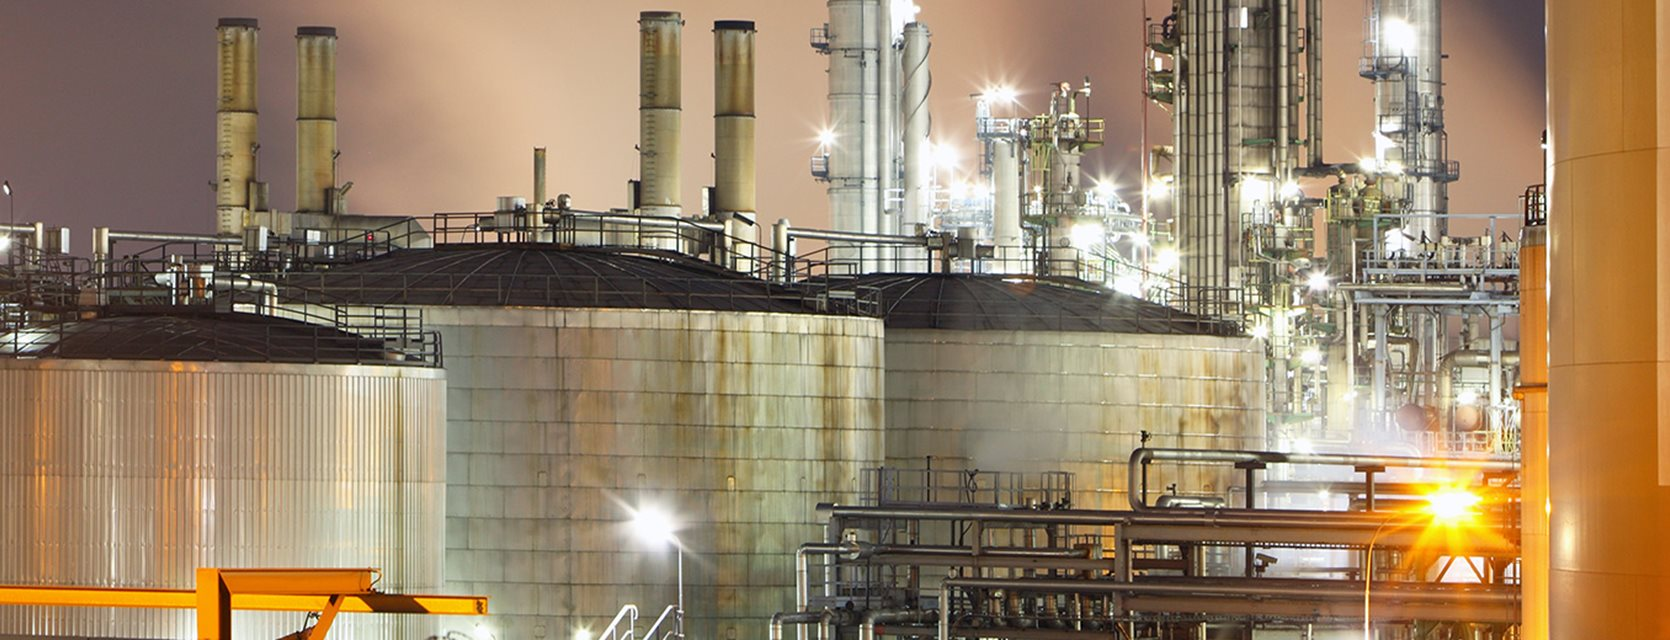 Valves for refining industry.